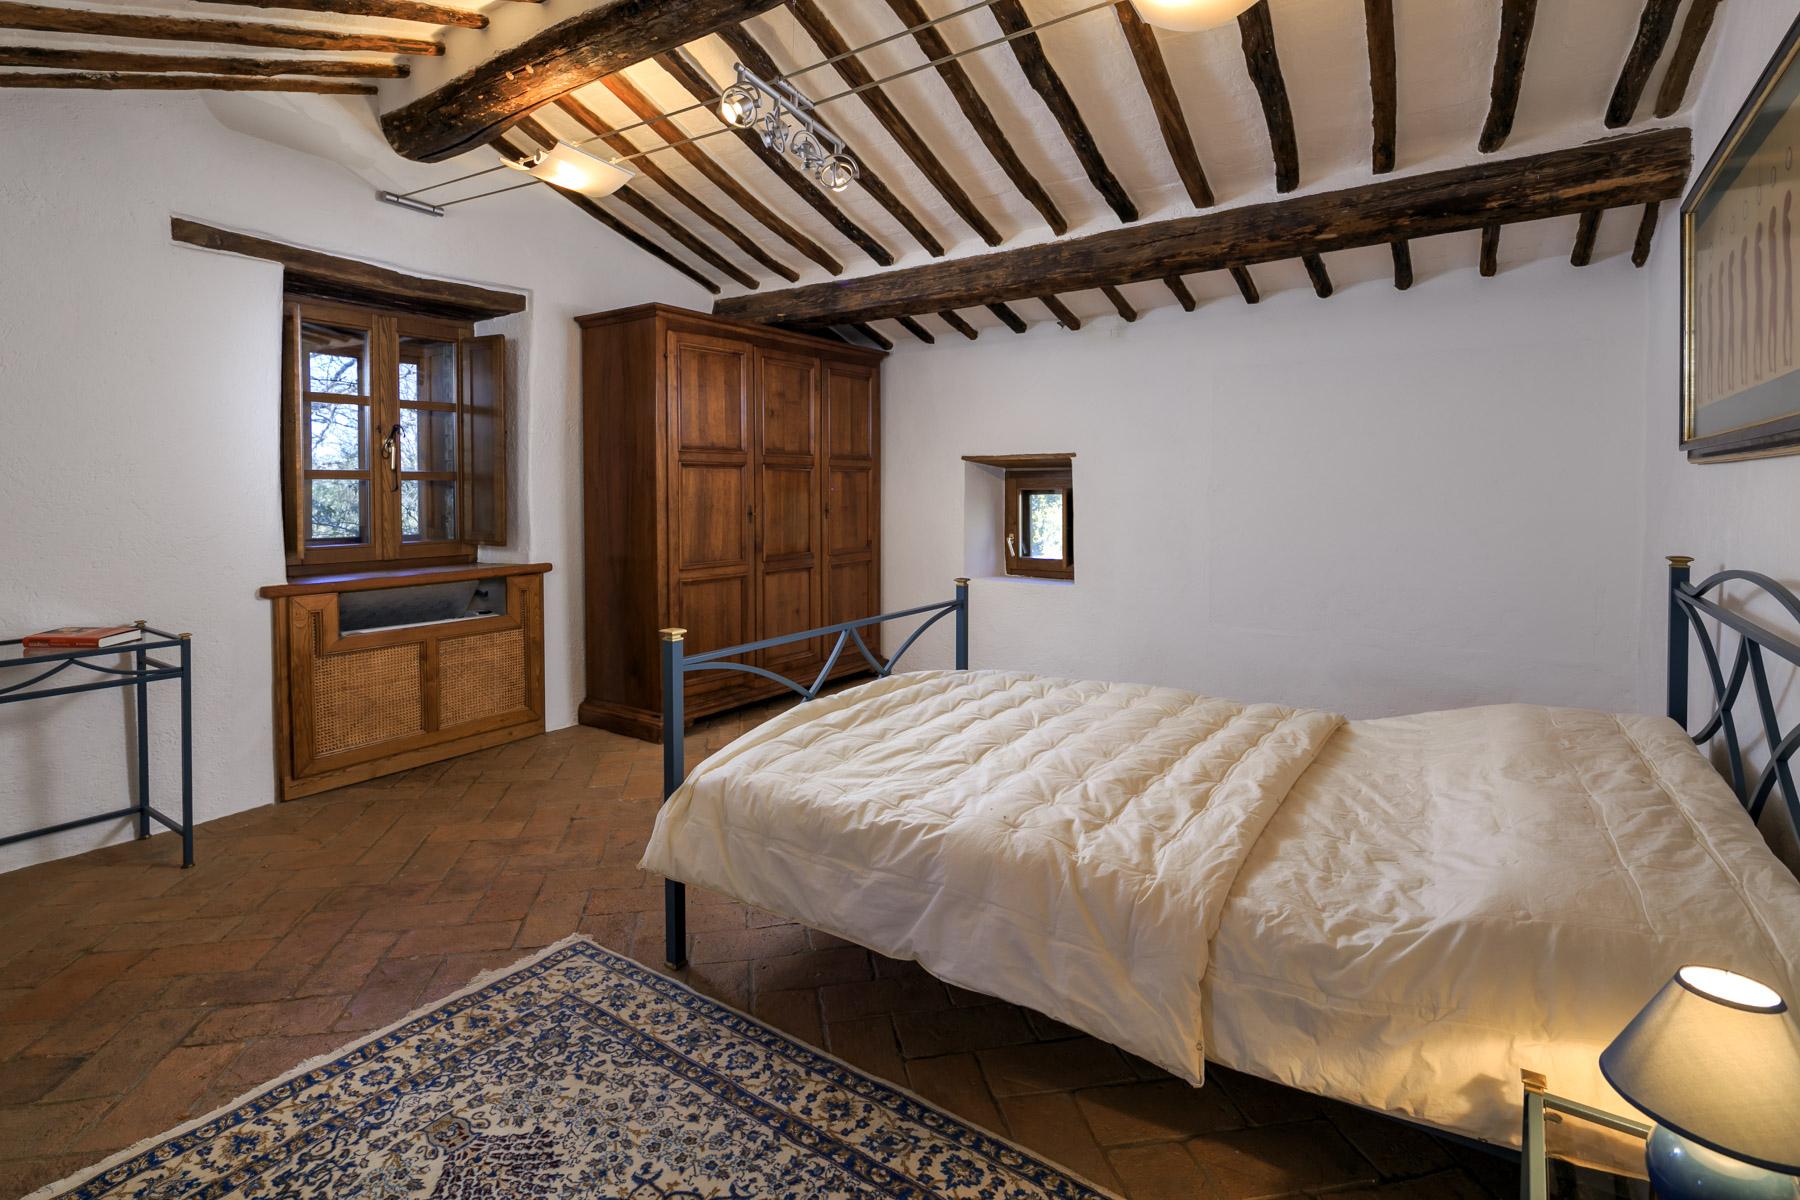 Villa in Vendita a Gaiole In Chianti: 5 locali, 465 mq - Foto 29